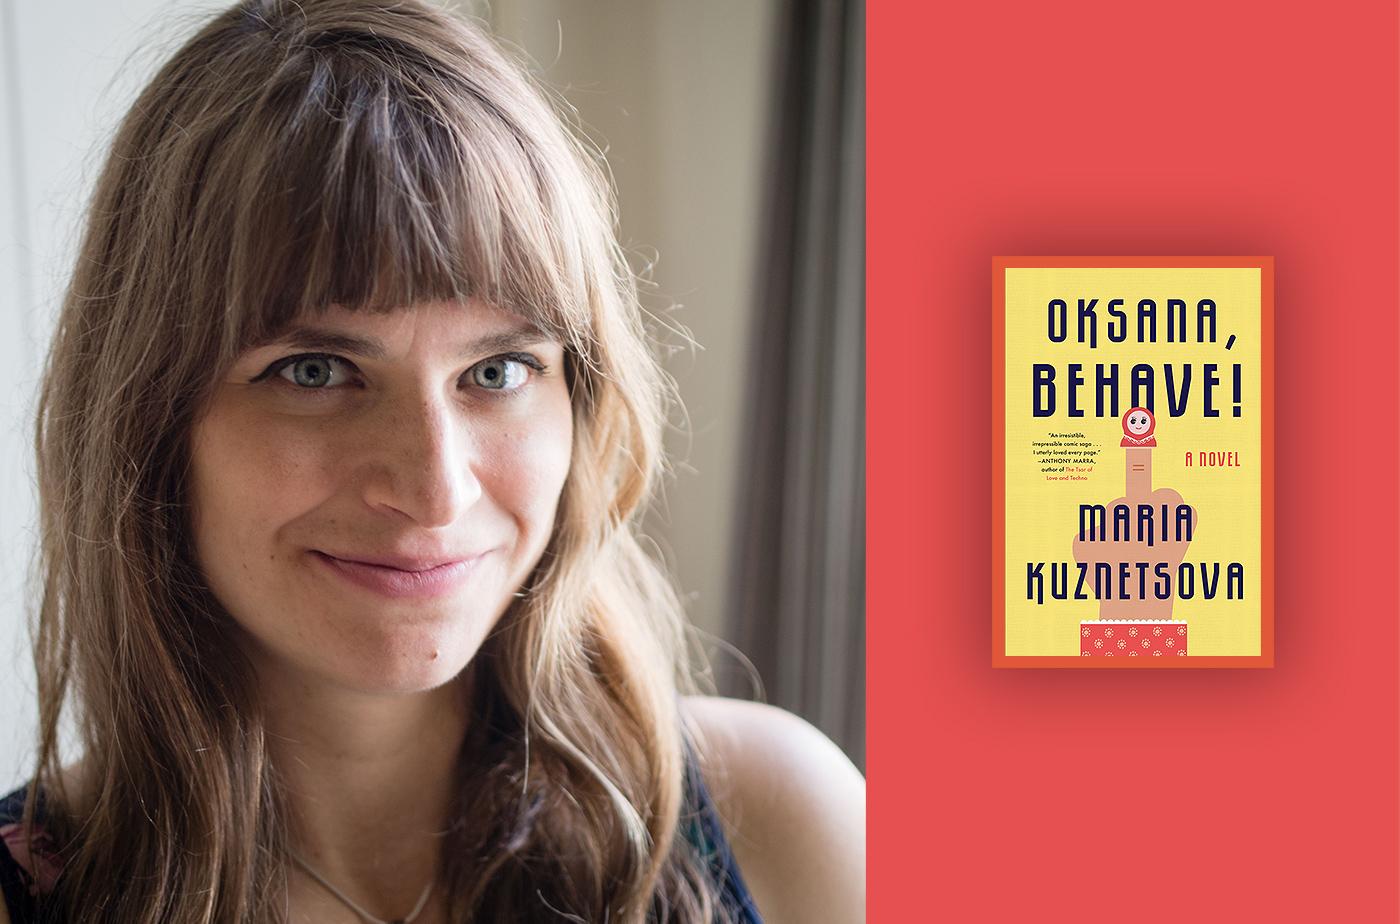 Catapult online classes: Maria Kuznetsova, 6-Week Online Fiction Workshop: The Magic of the Young Narrator, Fiction, Workshop